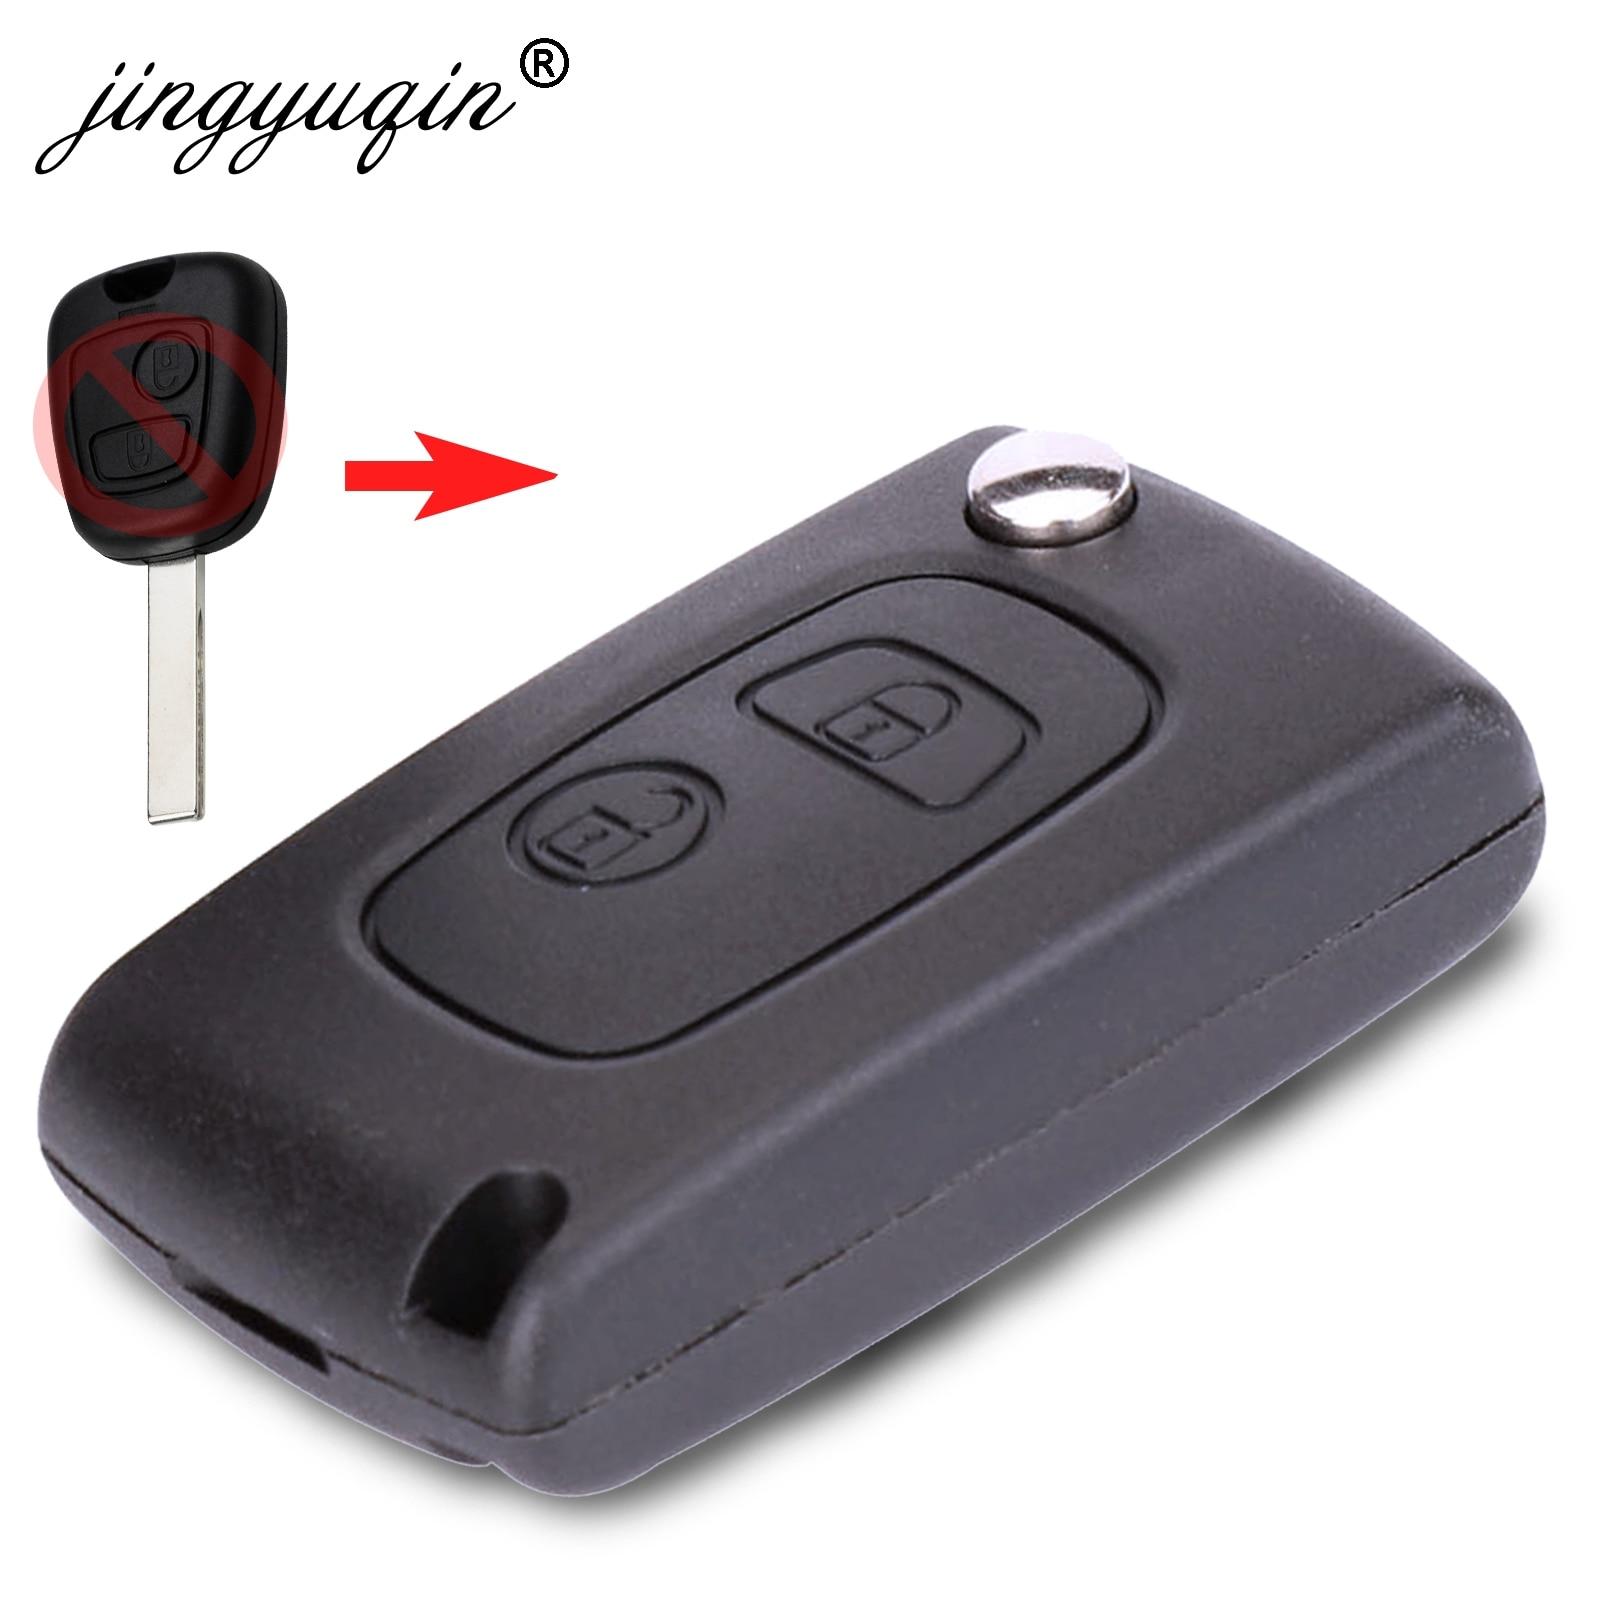 Jingyuqin 10 2 pçs/lote Flip Botão do Controle Remoto Caso Chave Do Carro Shell Para Peugeot 107 207 407 106 206 306 Modificado VA2 Chave Fob